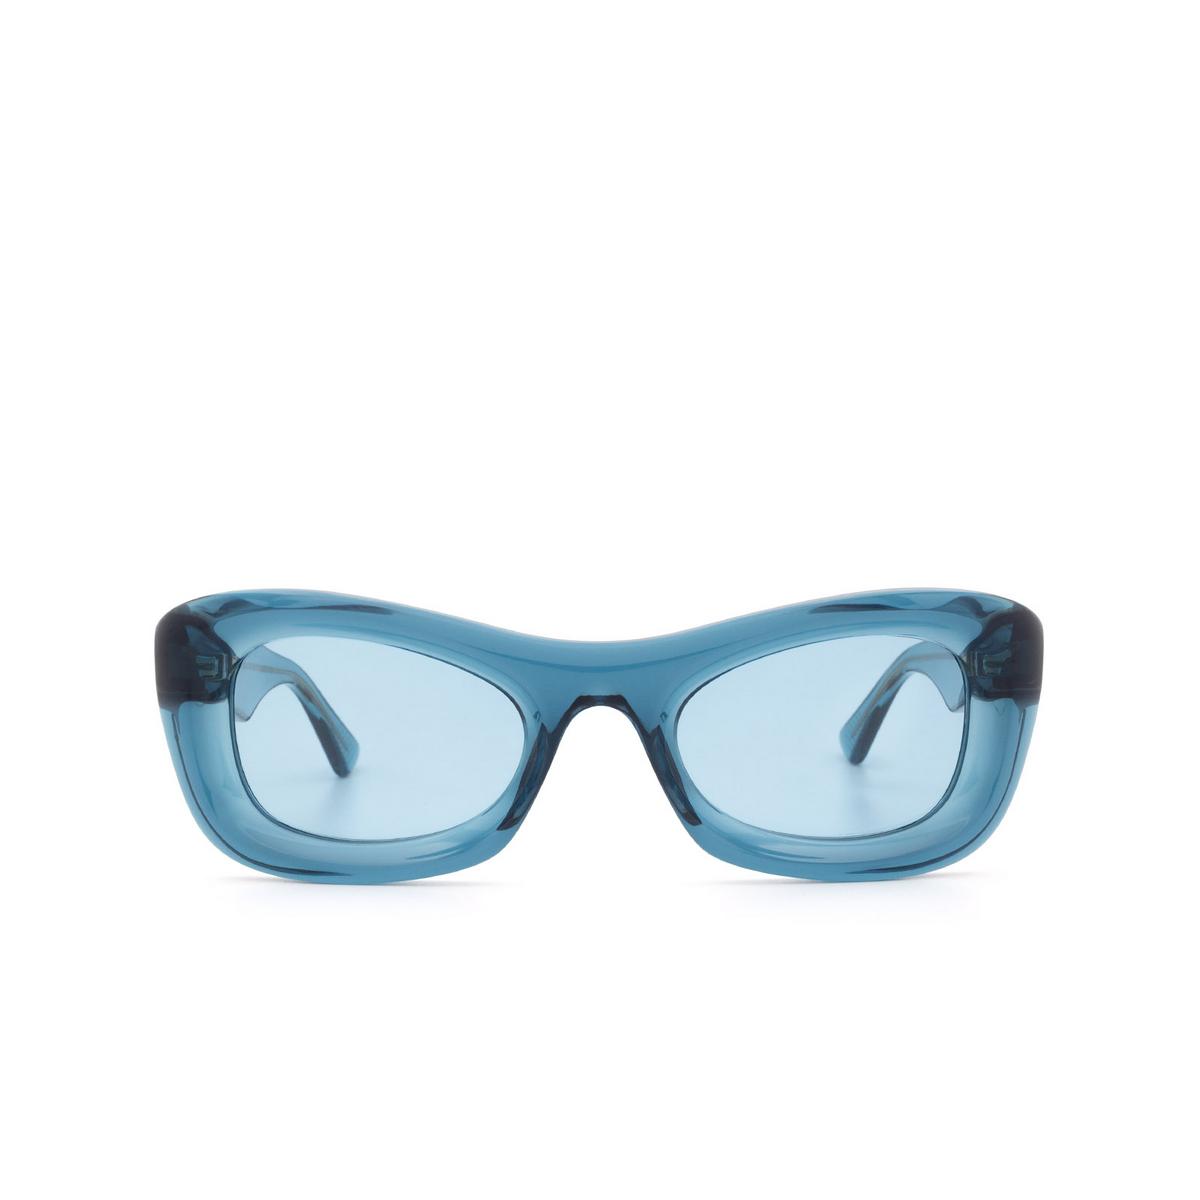 Bottega Veneta® Rectangle Sunglasses: BV1088S color Blue 001 - front view.